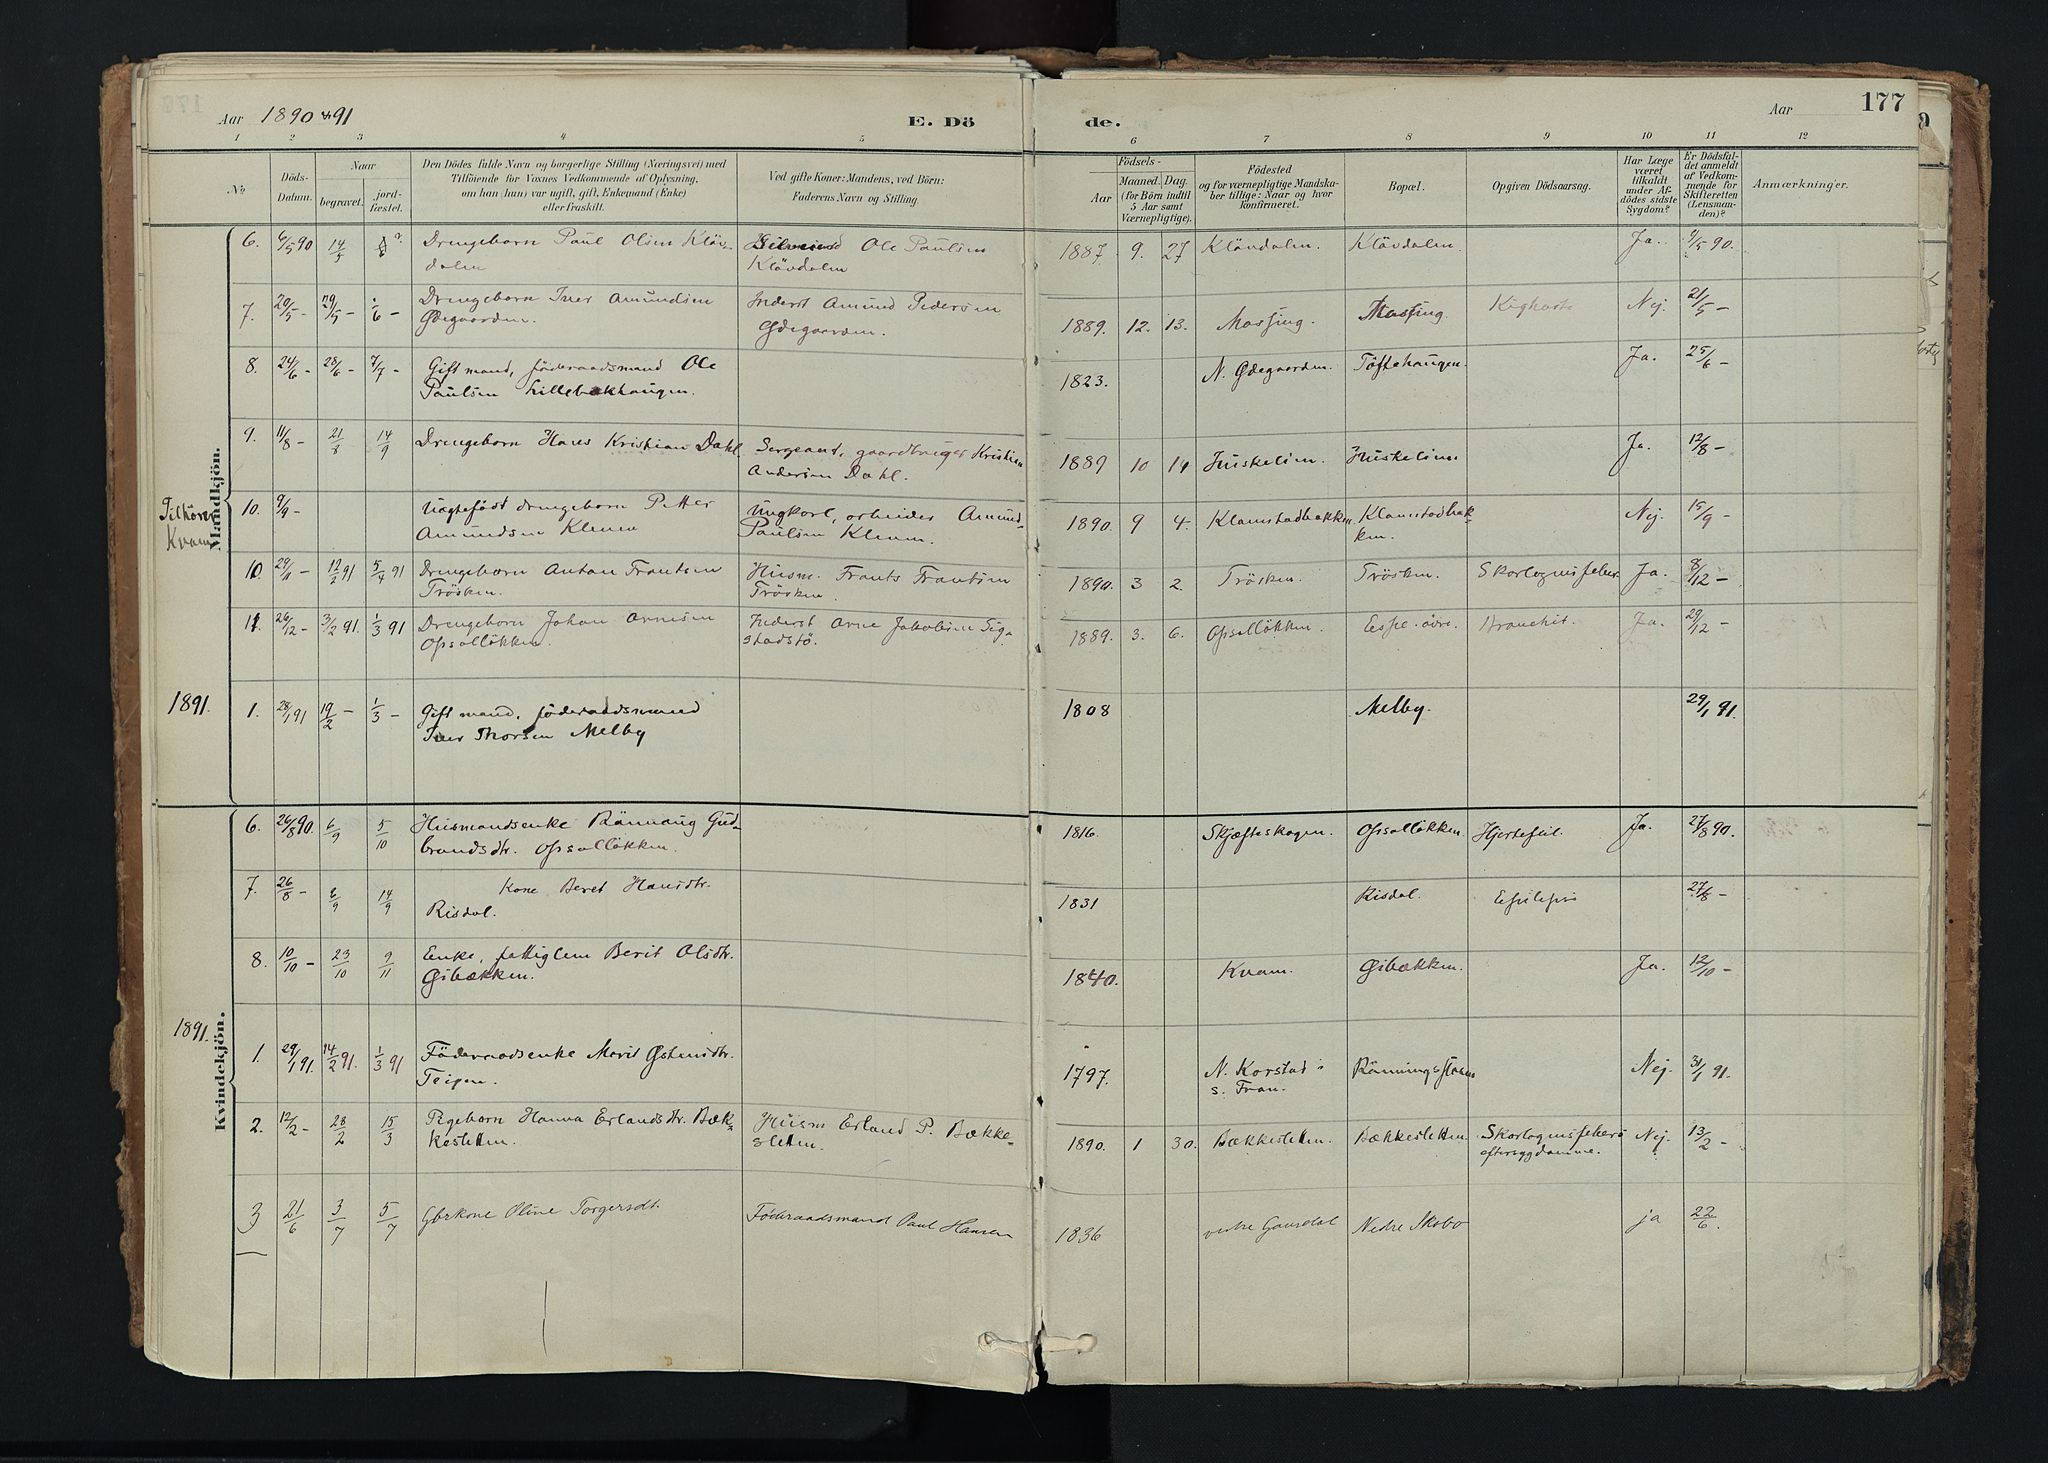 SAH, Nord-Fron prestekontor, Ministerialbok nr. 5, 1884-1914, s. 177